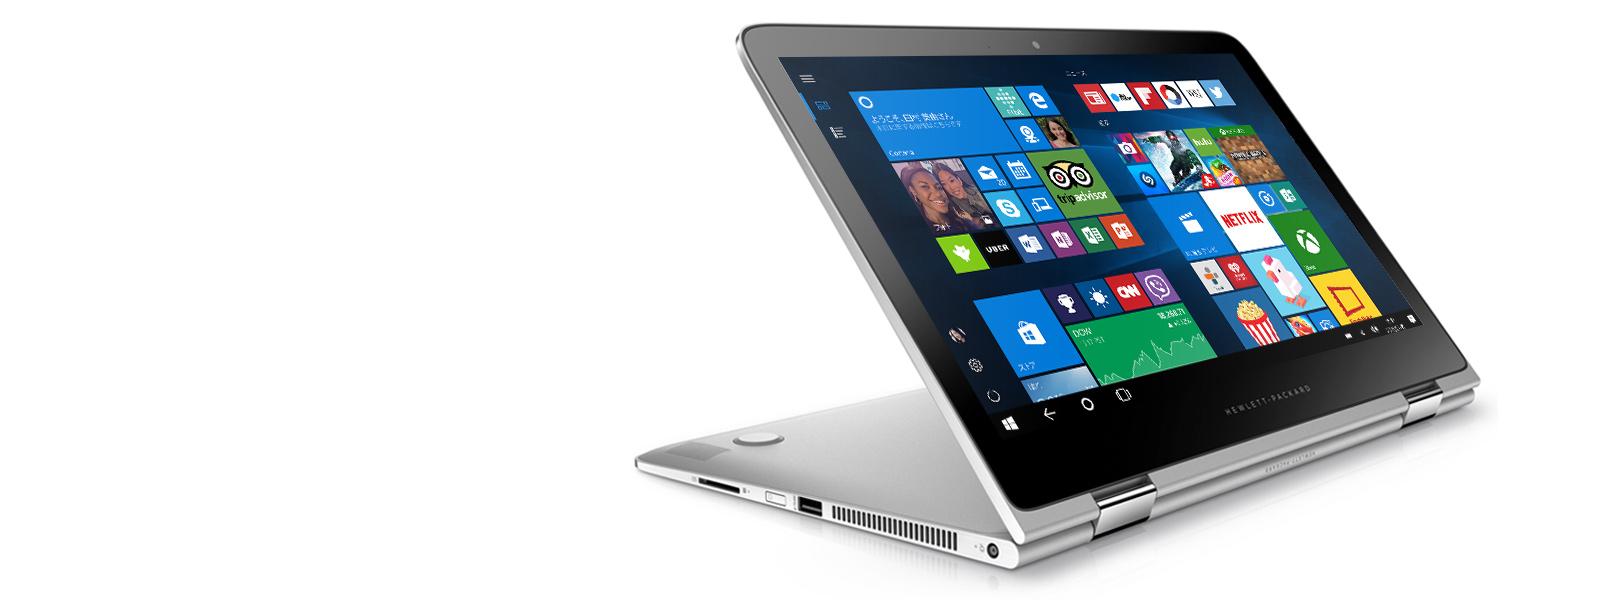 Windows 10 スタート画面を表示した HP Spectre x360 13